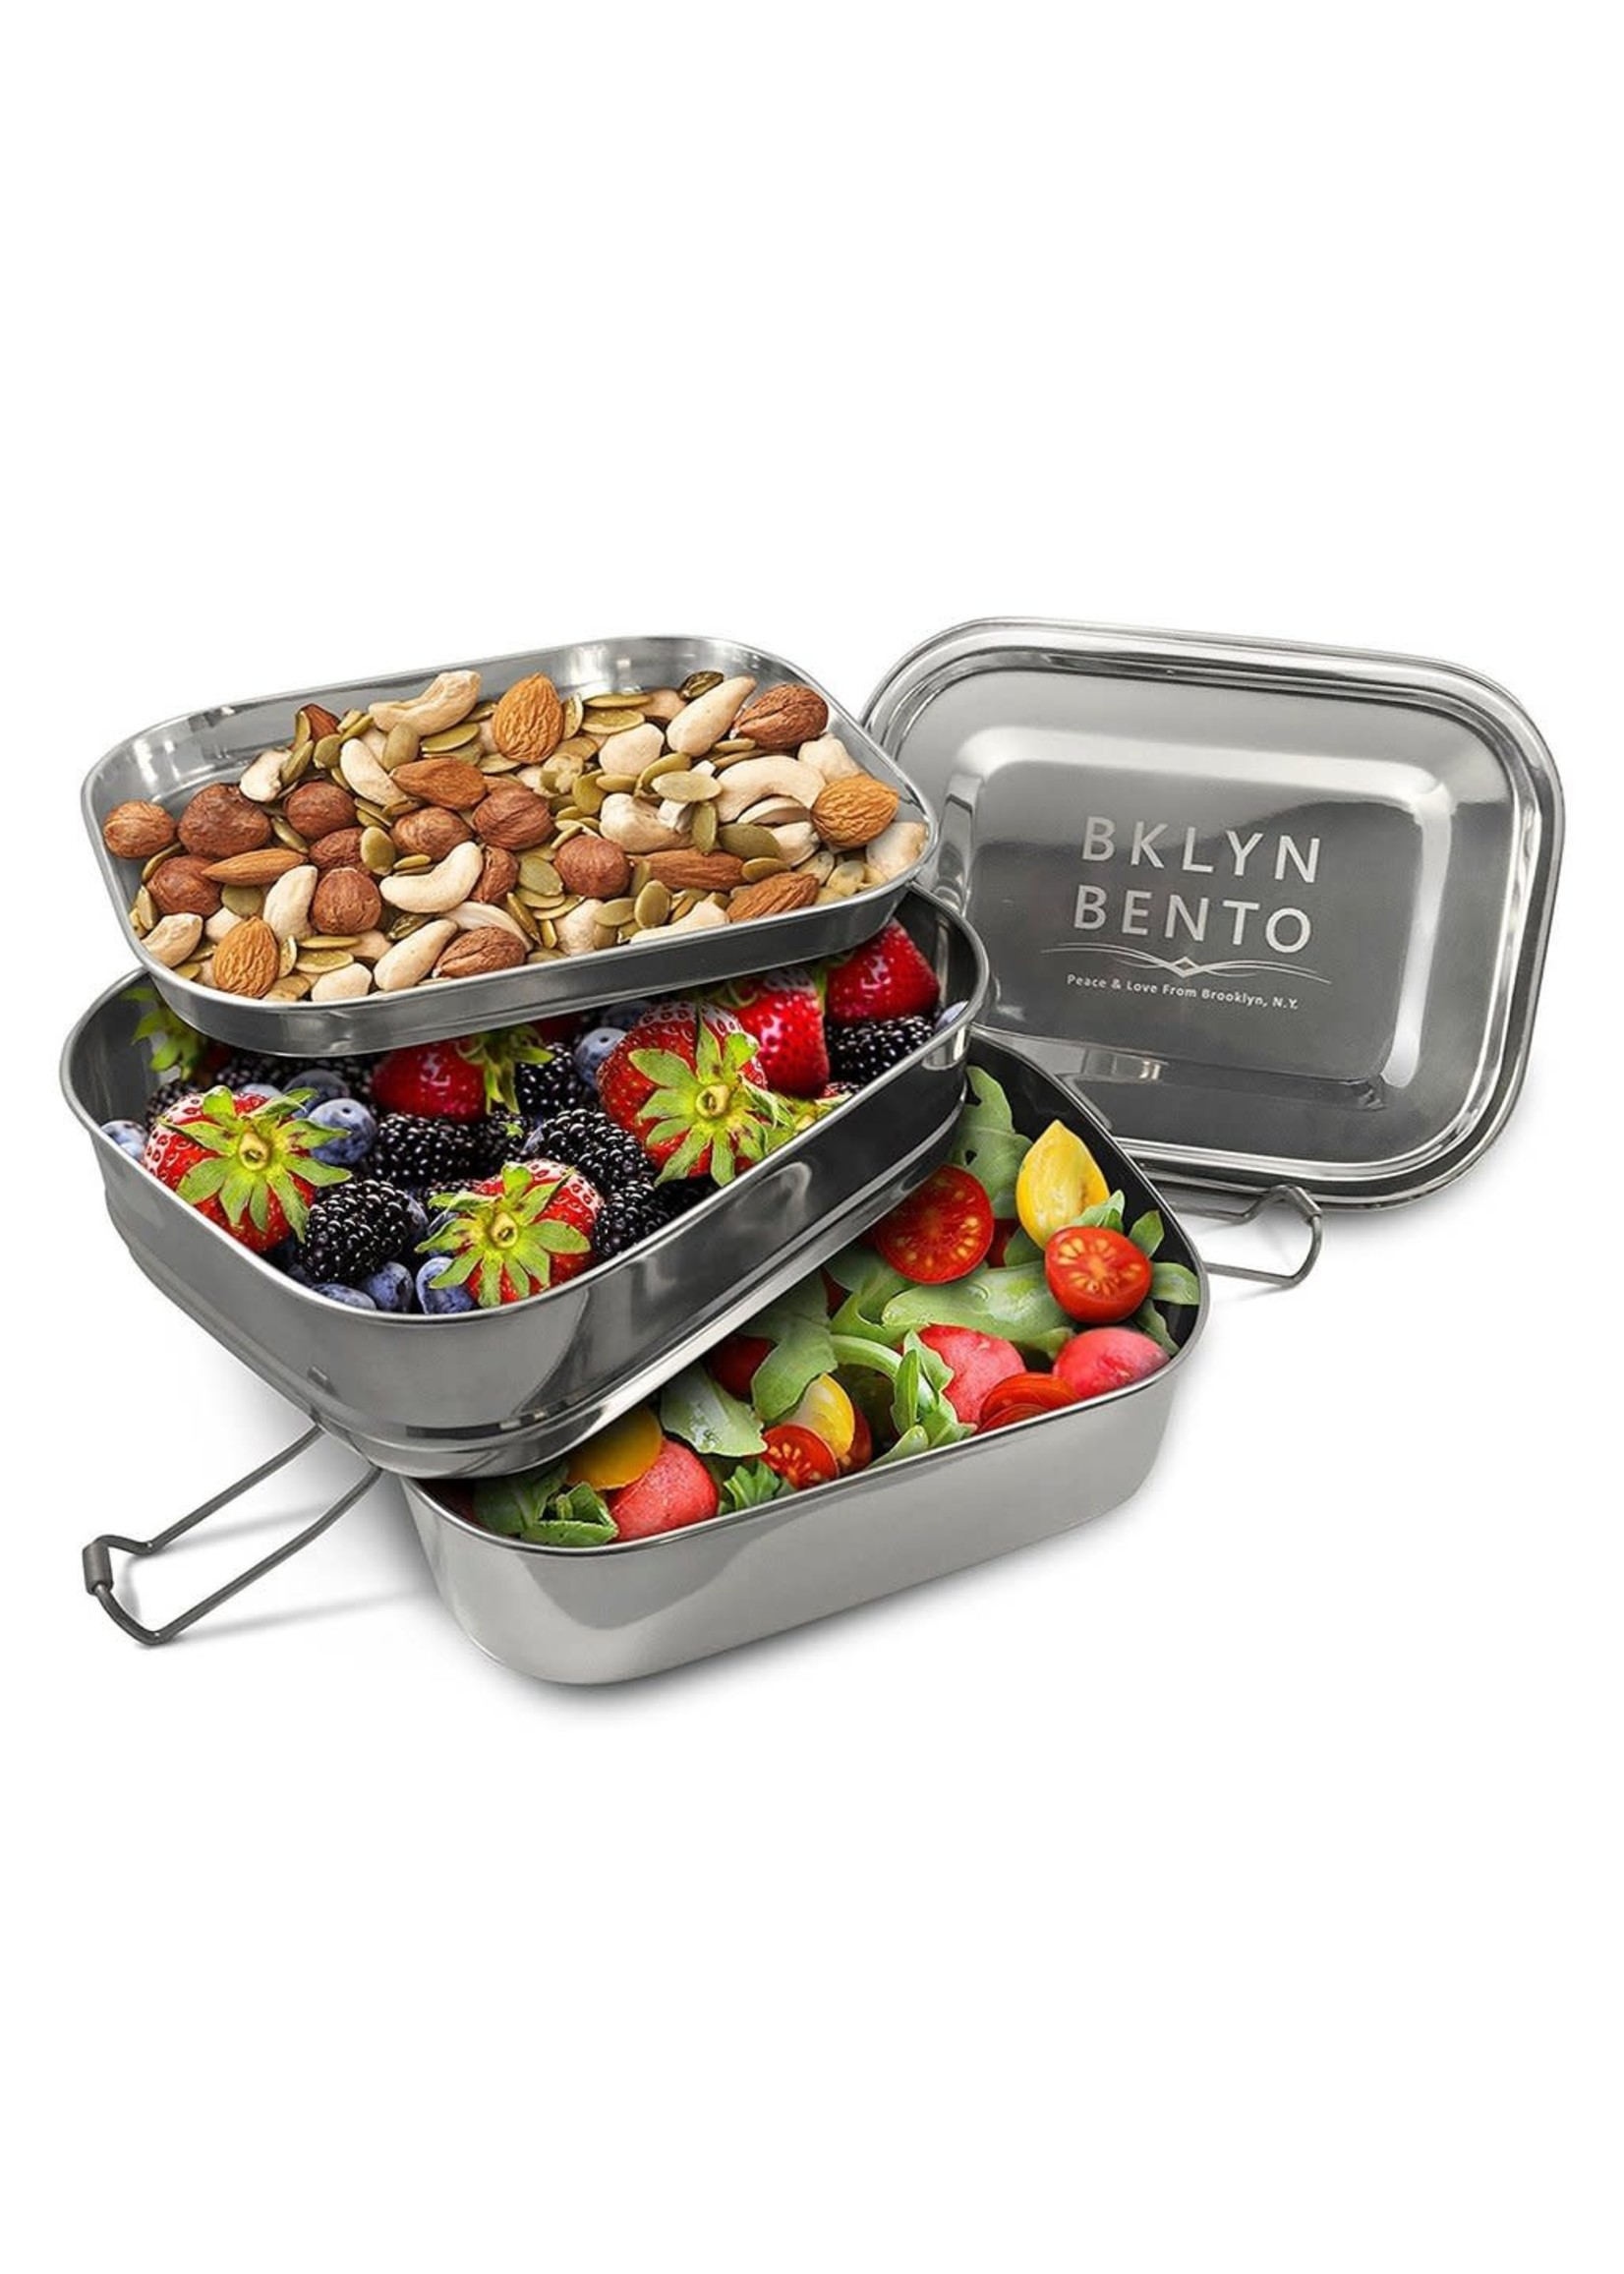 Brooklyn Bento Stainless Steel Bento Box